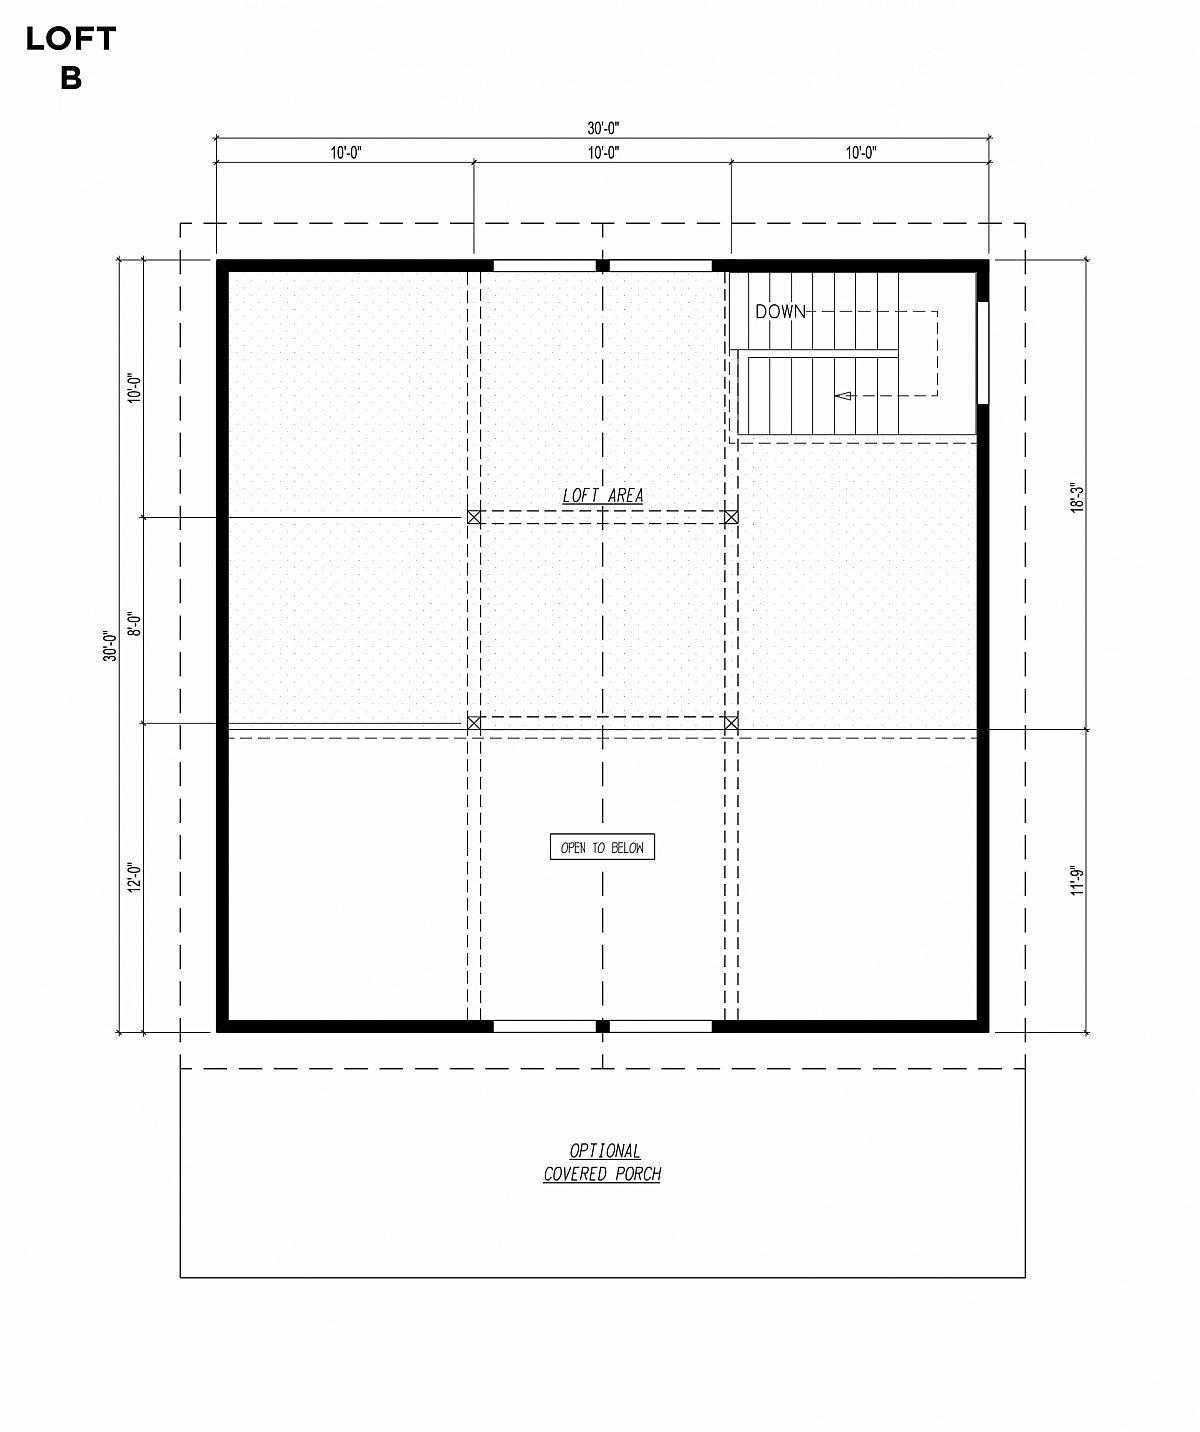 Timberlyne Blue Jay Cabin 30x30 Floor Plan Loft B